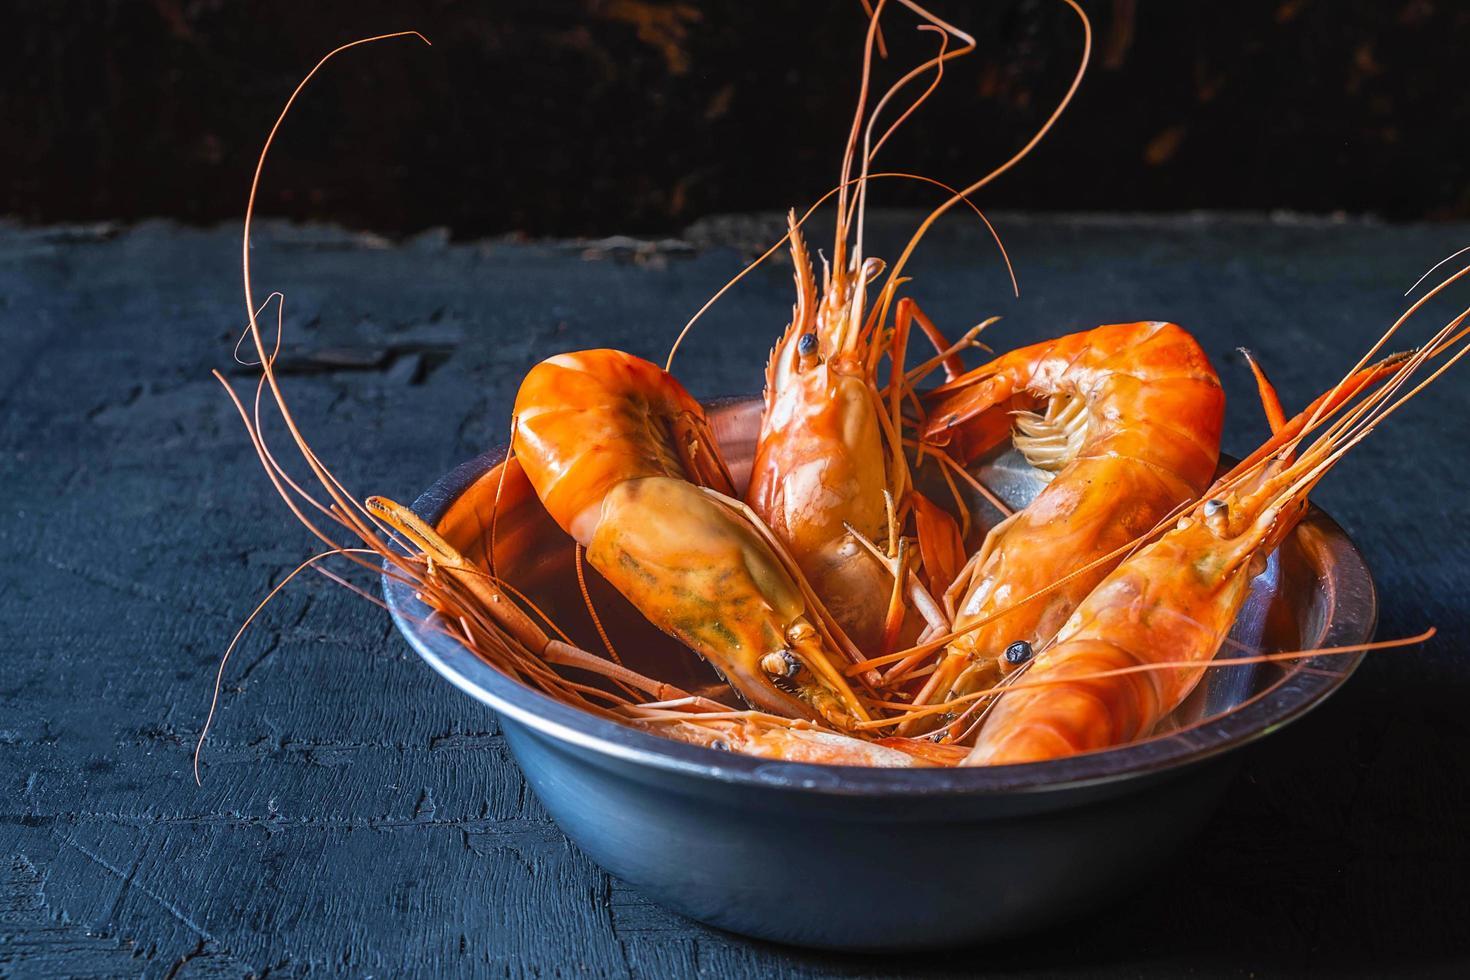 Shrimp on a dark background photo